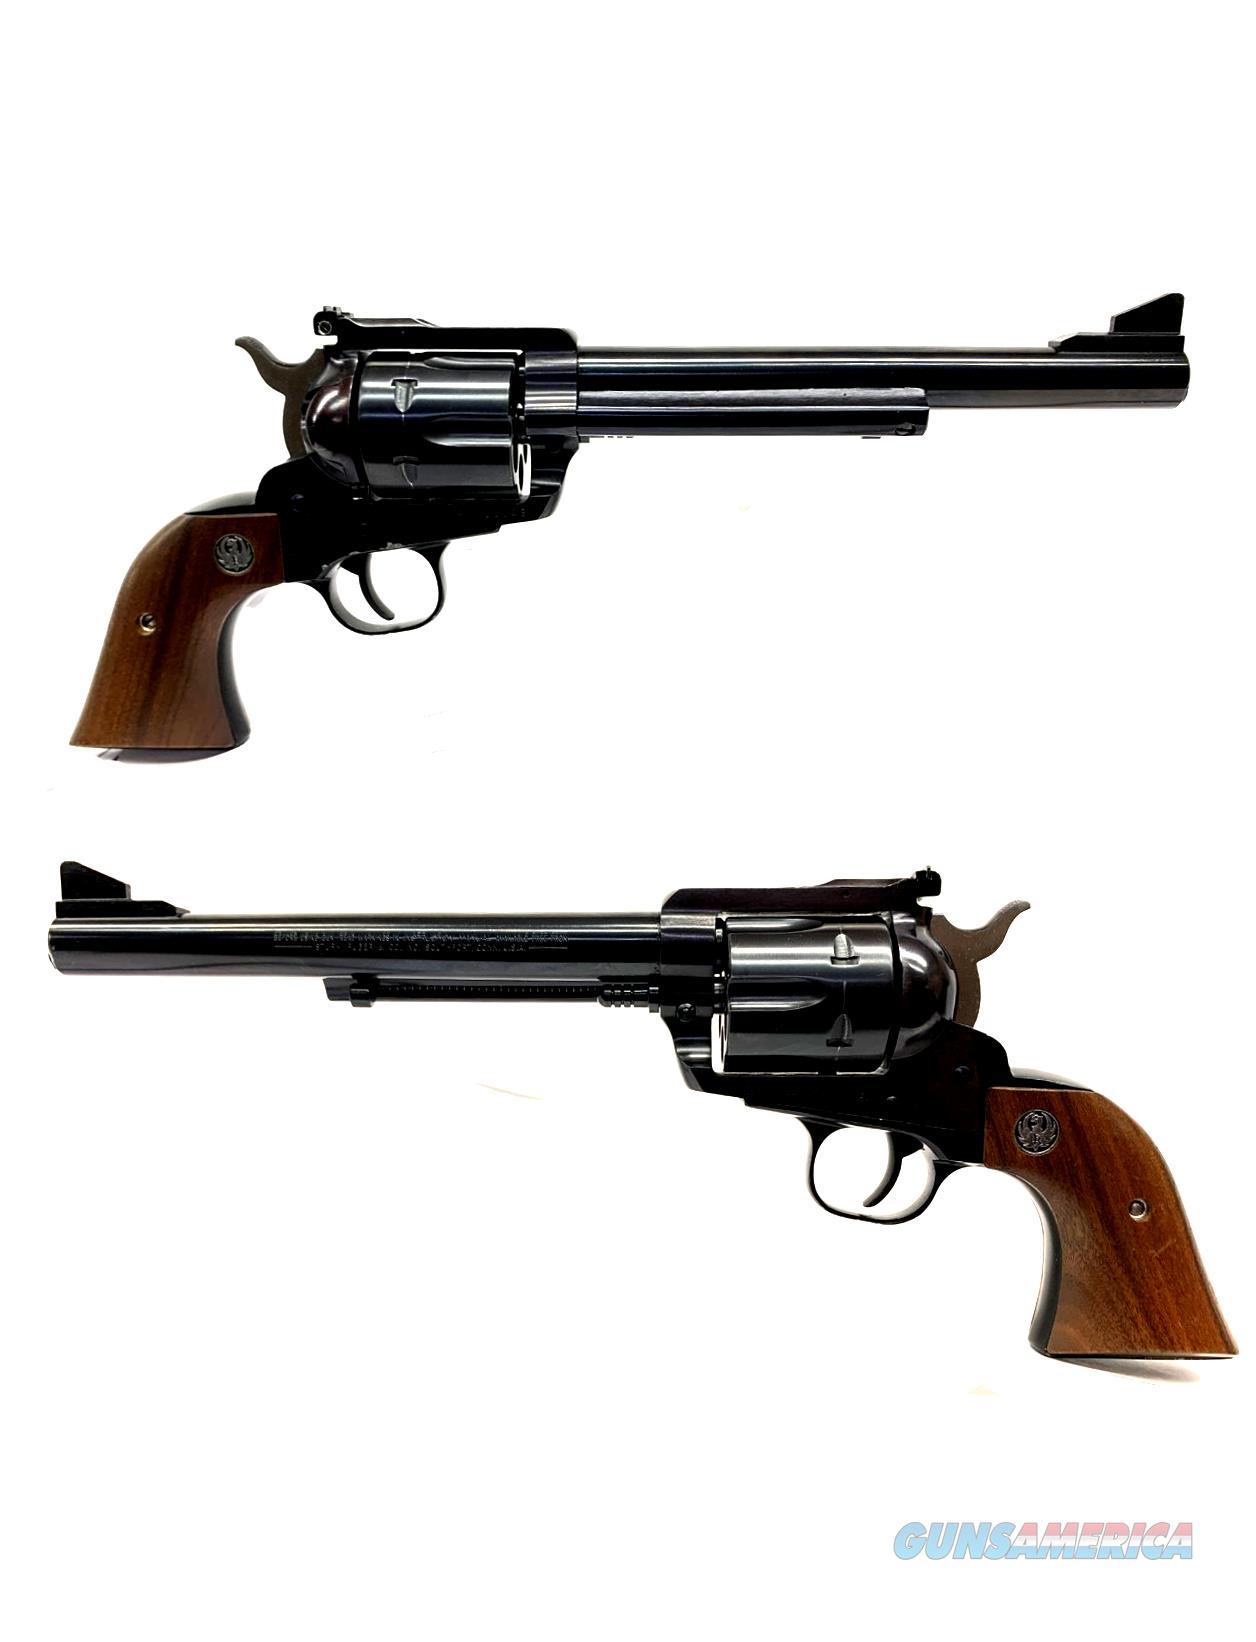 Ruger New Model Blackhawk .45COLT Revolver  Guns > Pistols > Ruger Single Action Revolvers > Blackhawk Type